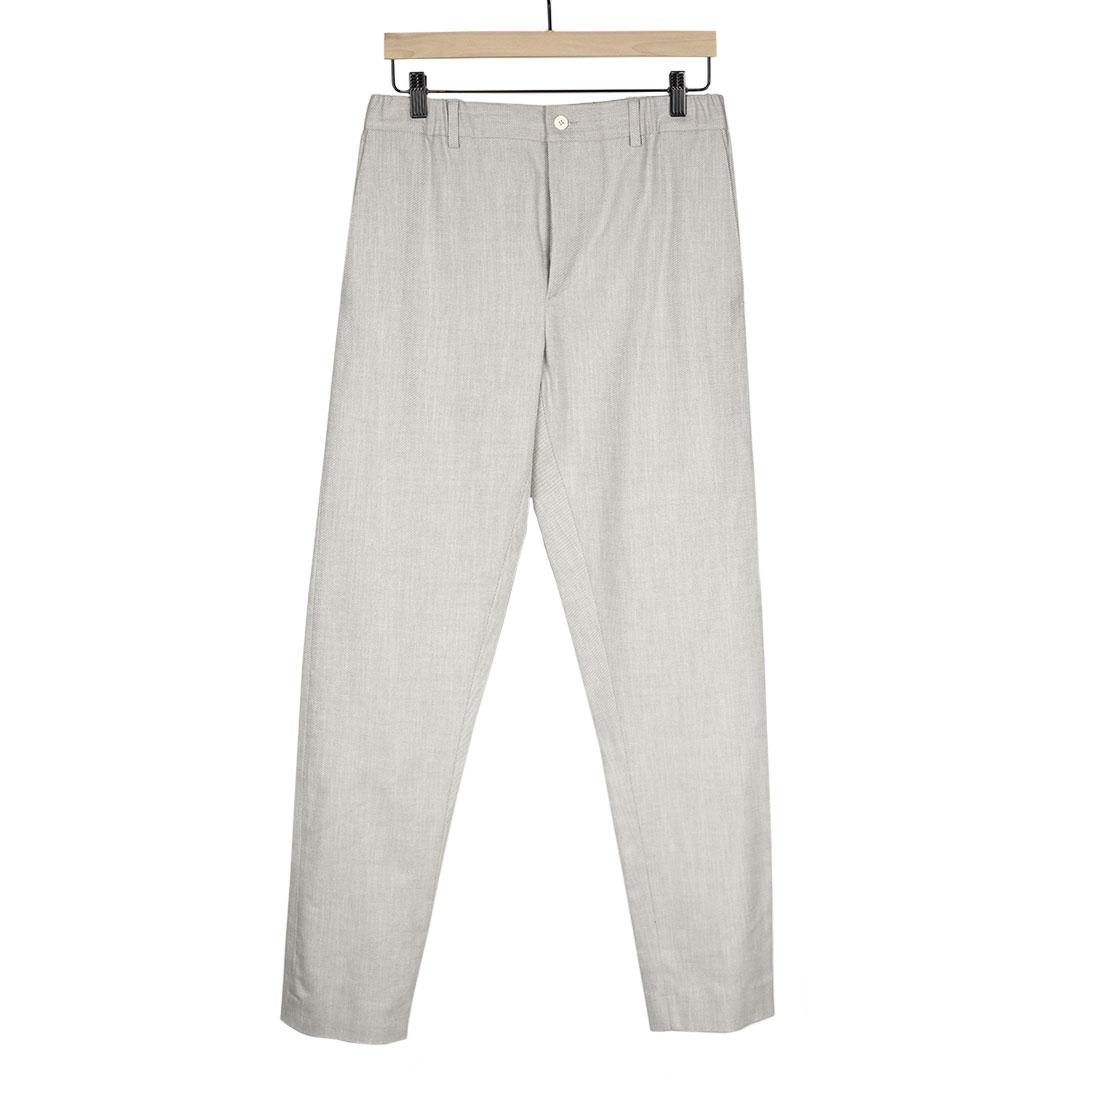 Stephan Schneider Spring Summer 2021 SS21 cotton twill easy pants (9).jpg